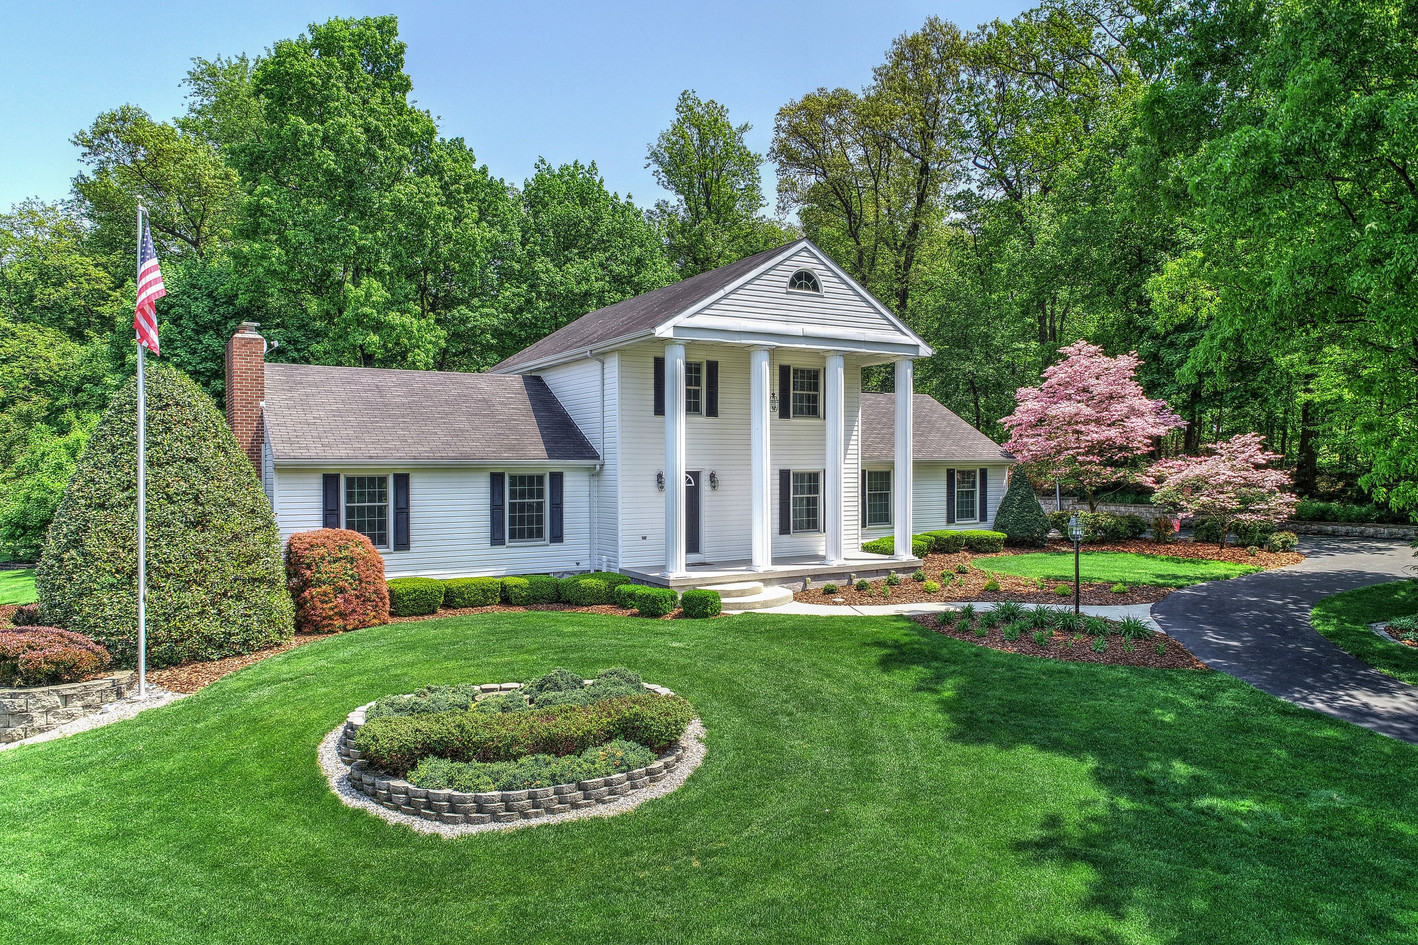 Carlisle PA Real Estate Photos